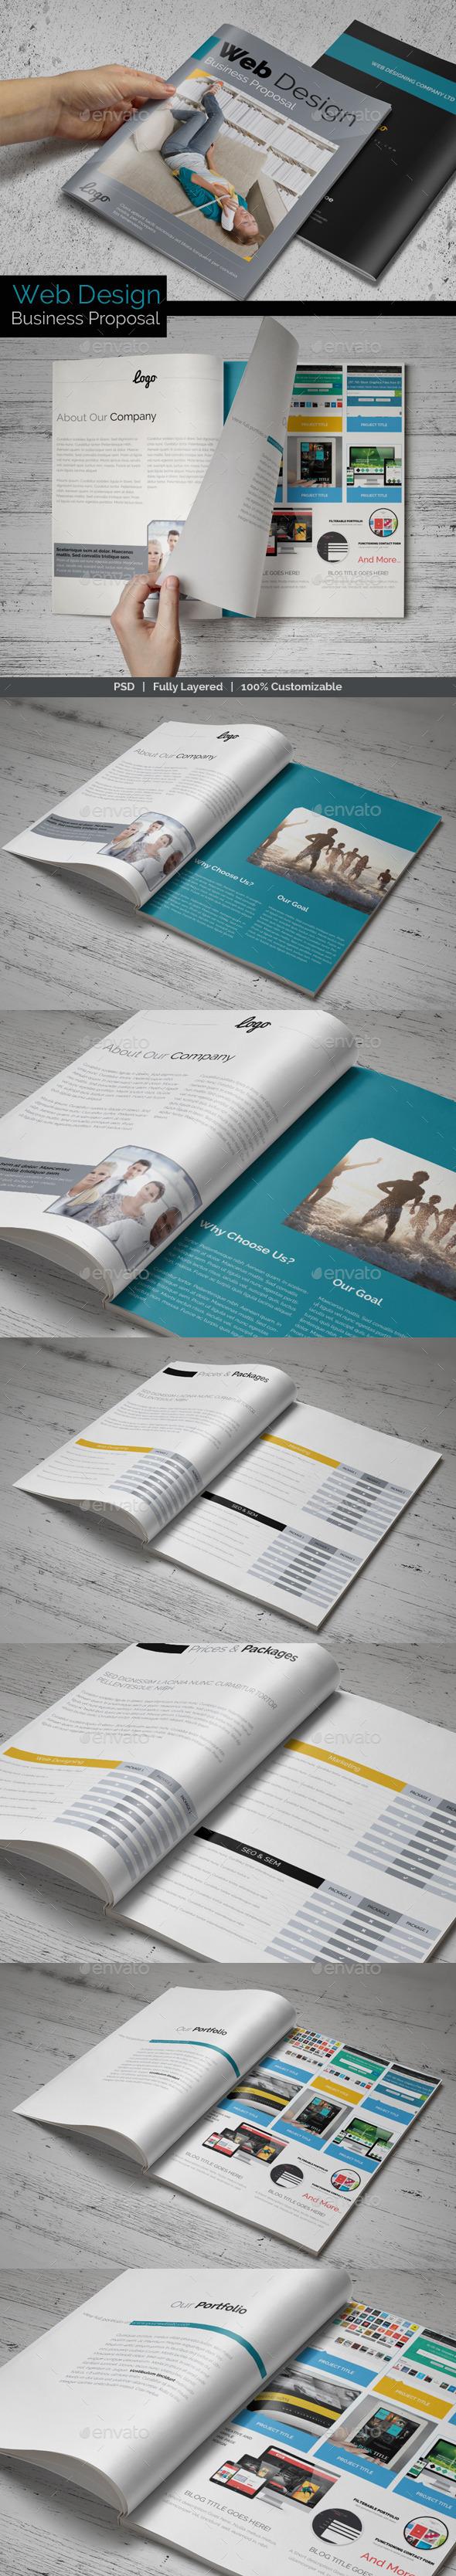 GraphicRiver Web Design Business Proposal 8893295